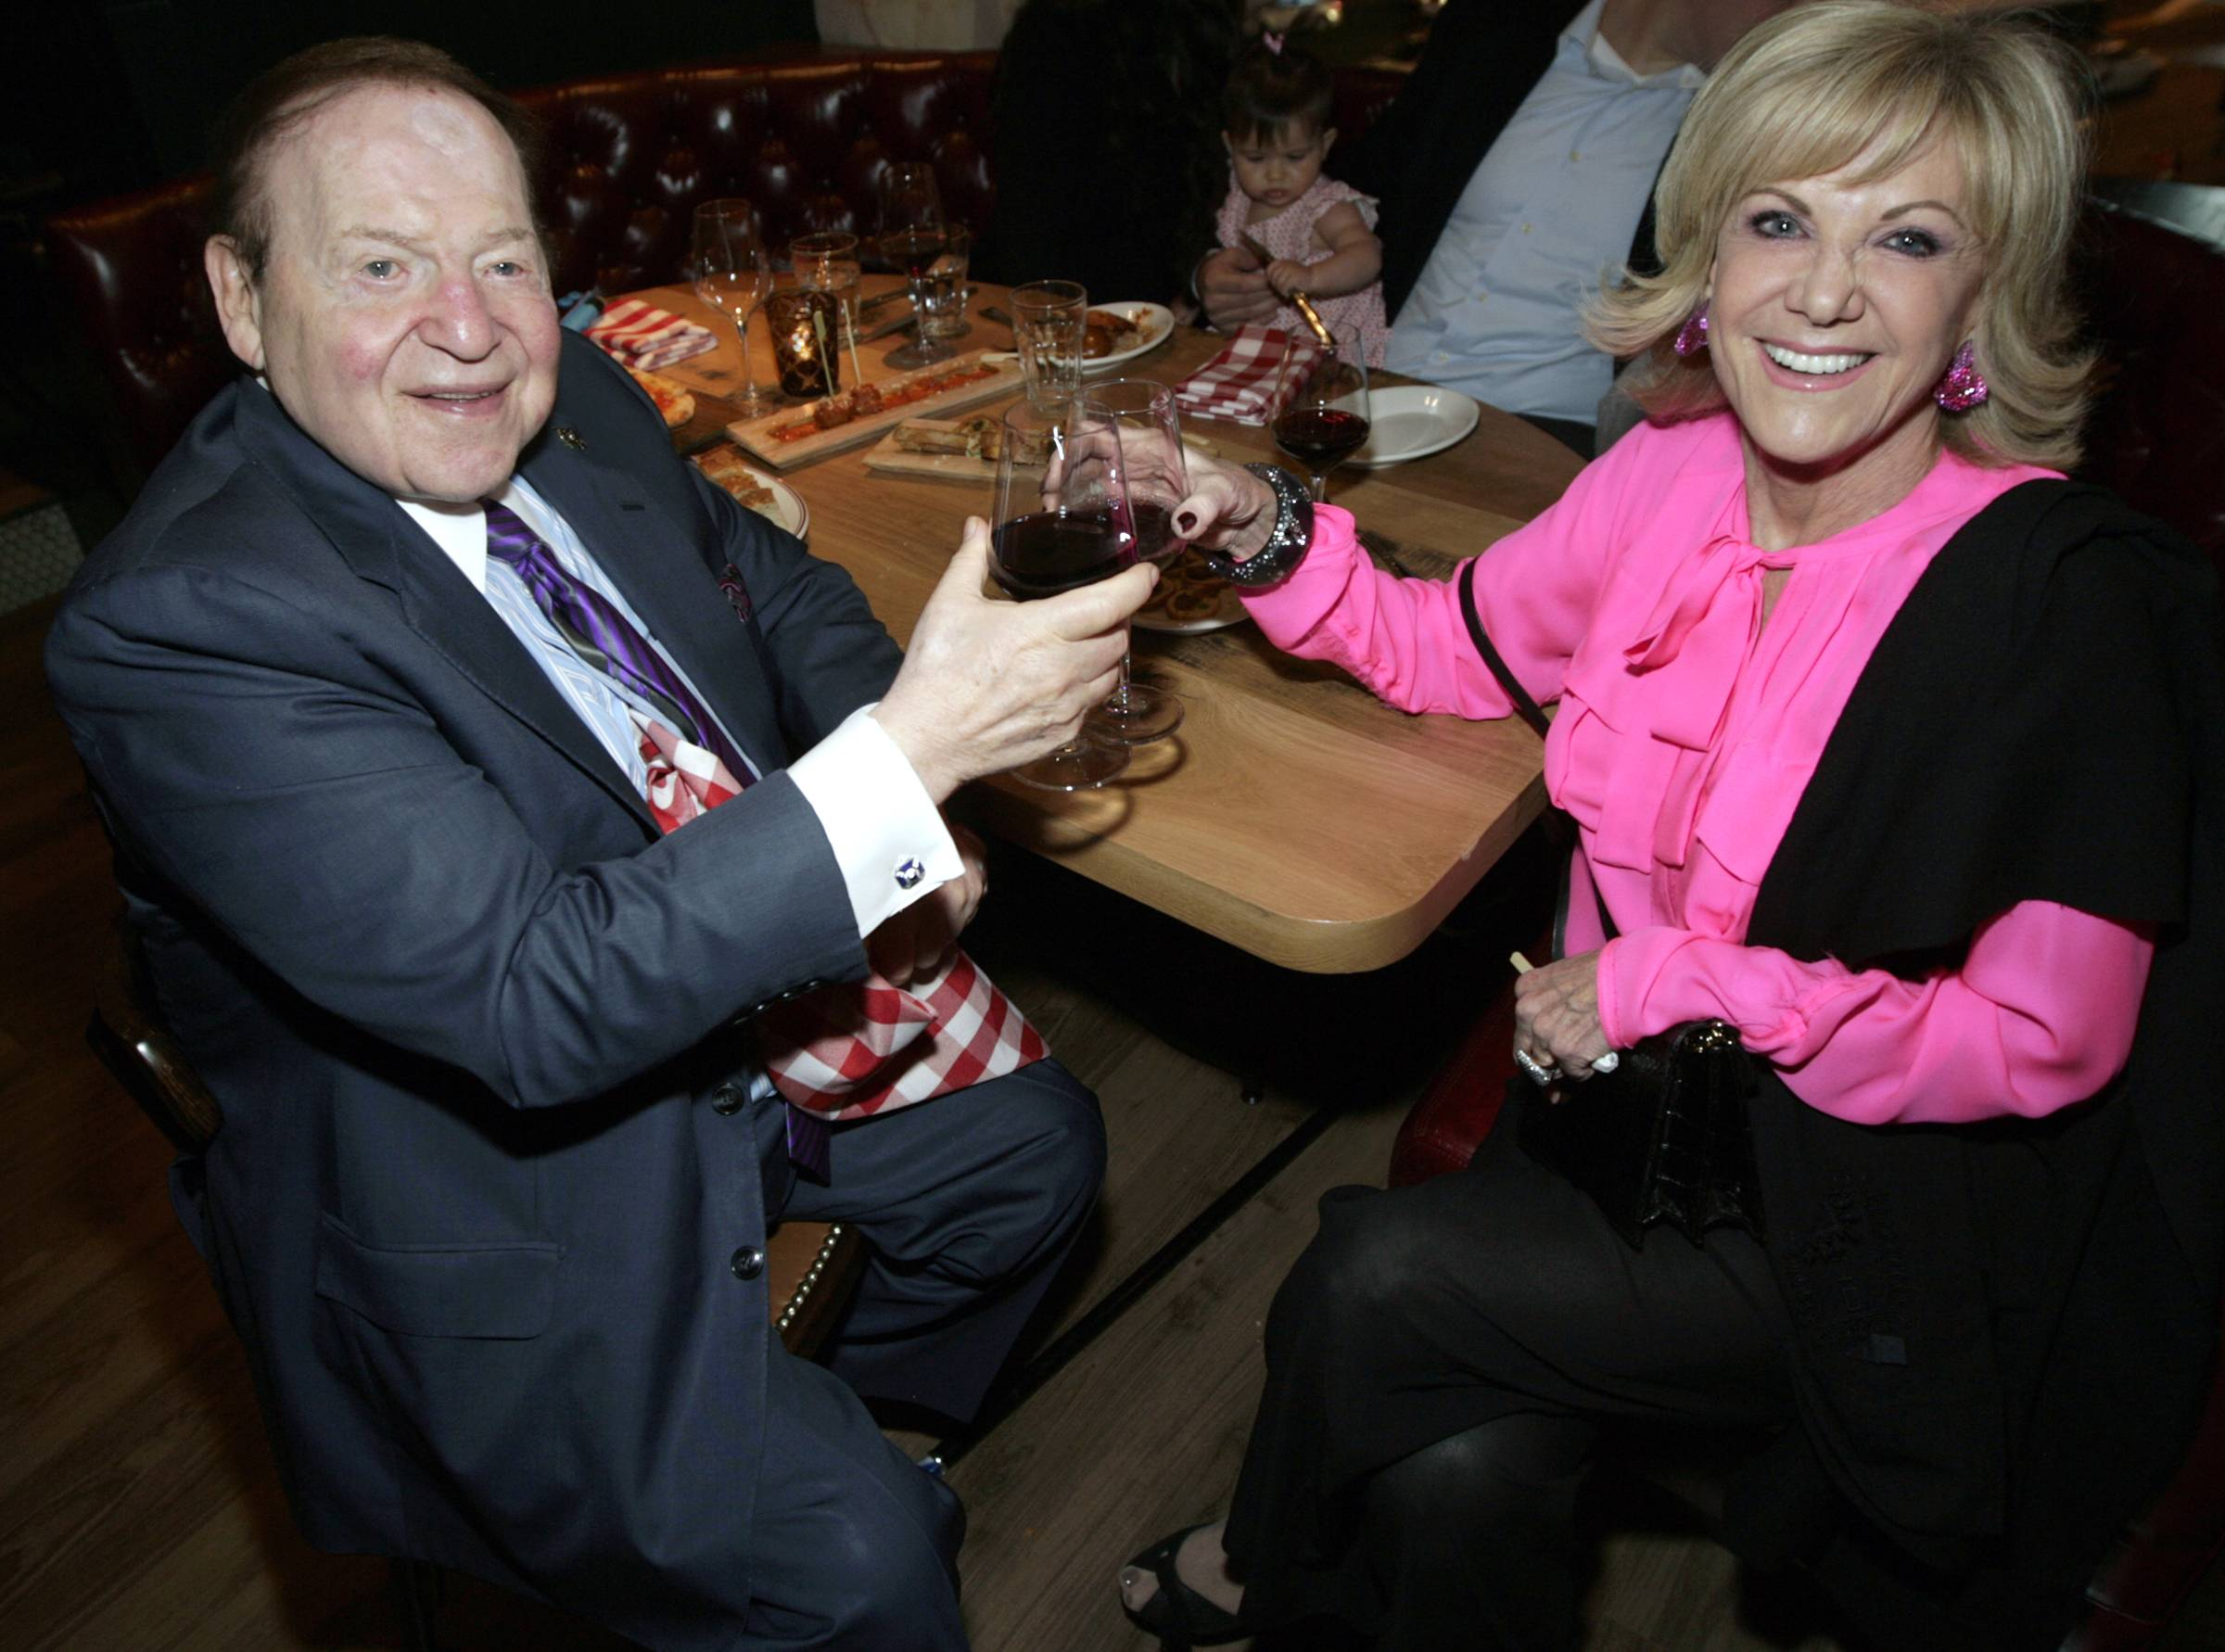 Sheldon Adelson & Elaine Wynn toast to the night. Photos: Los Caraballo